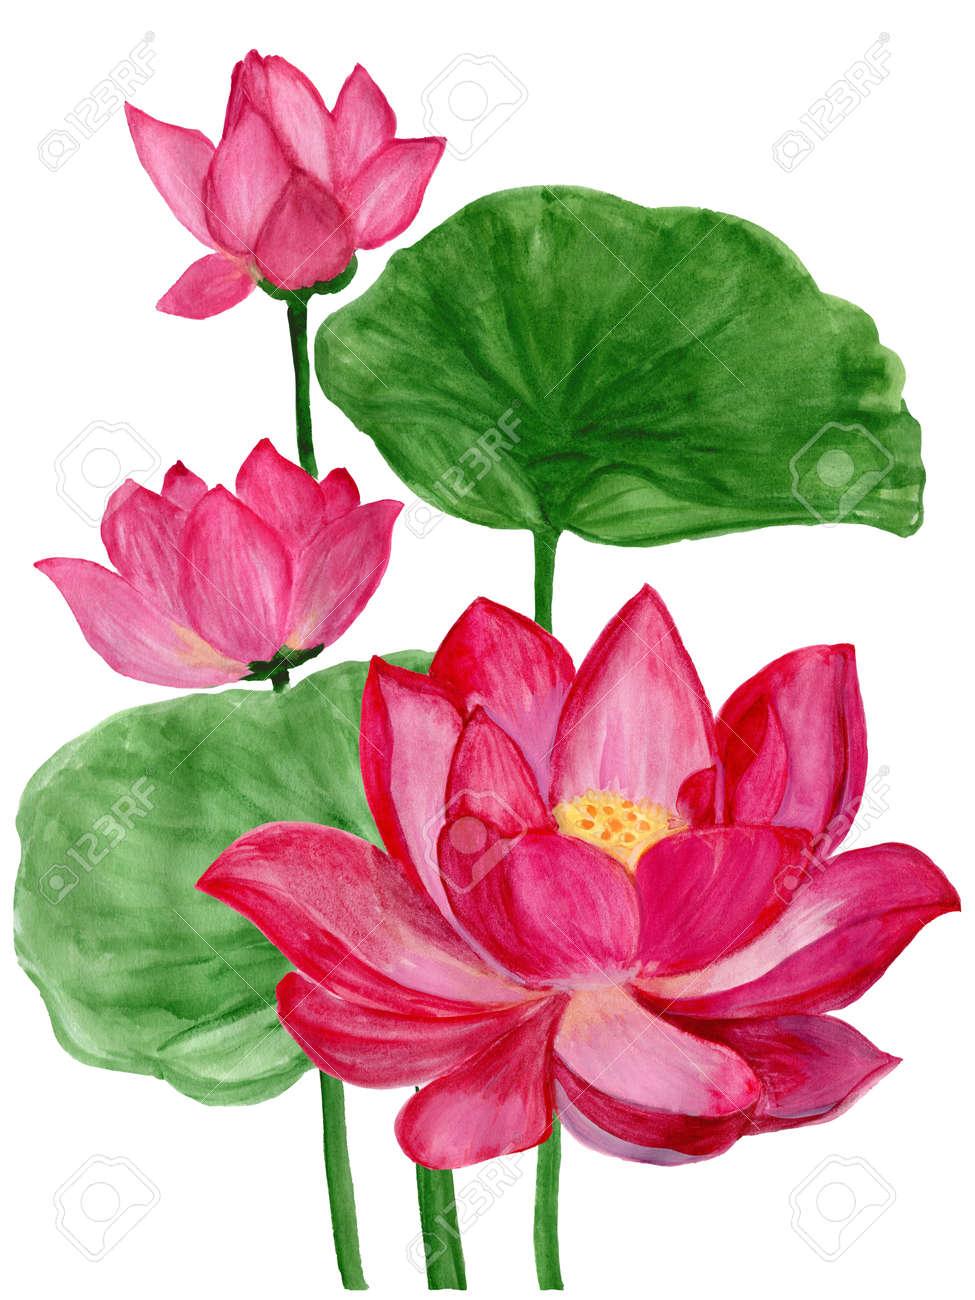 Hand drawn watercolor botanical illustration of lotus flower stock hand drawn watercolor botanical illustration of lotus flower pink stock illustration 74393678 izmirmasajfo Gallery